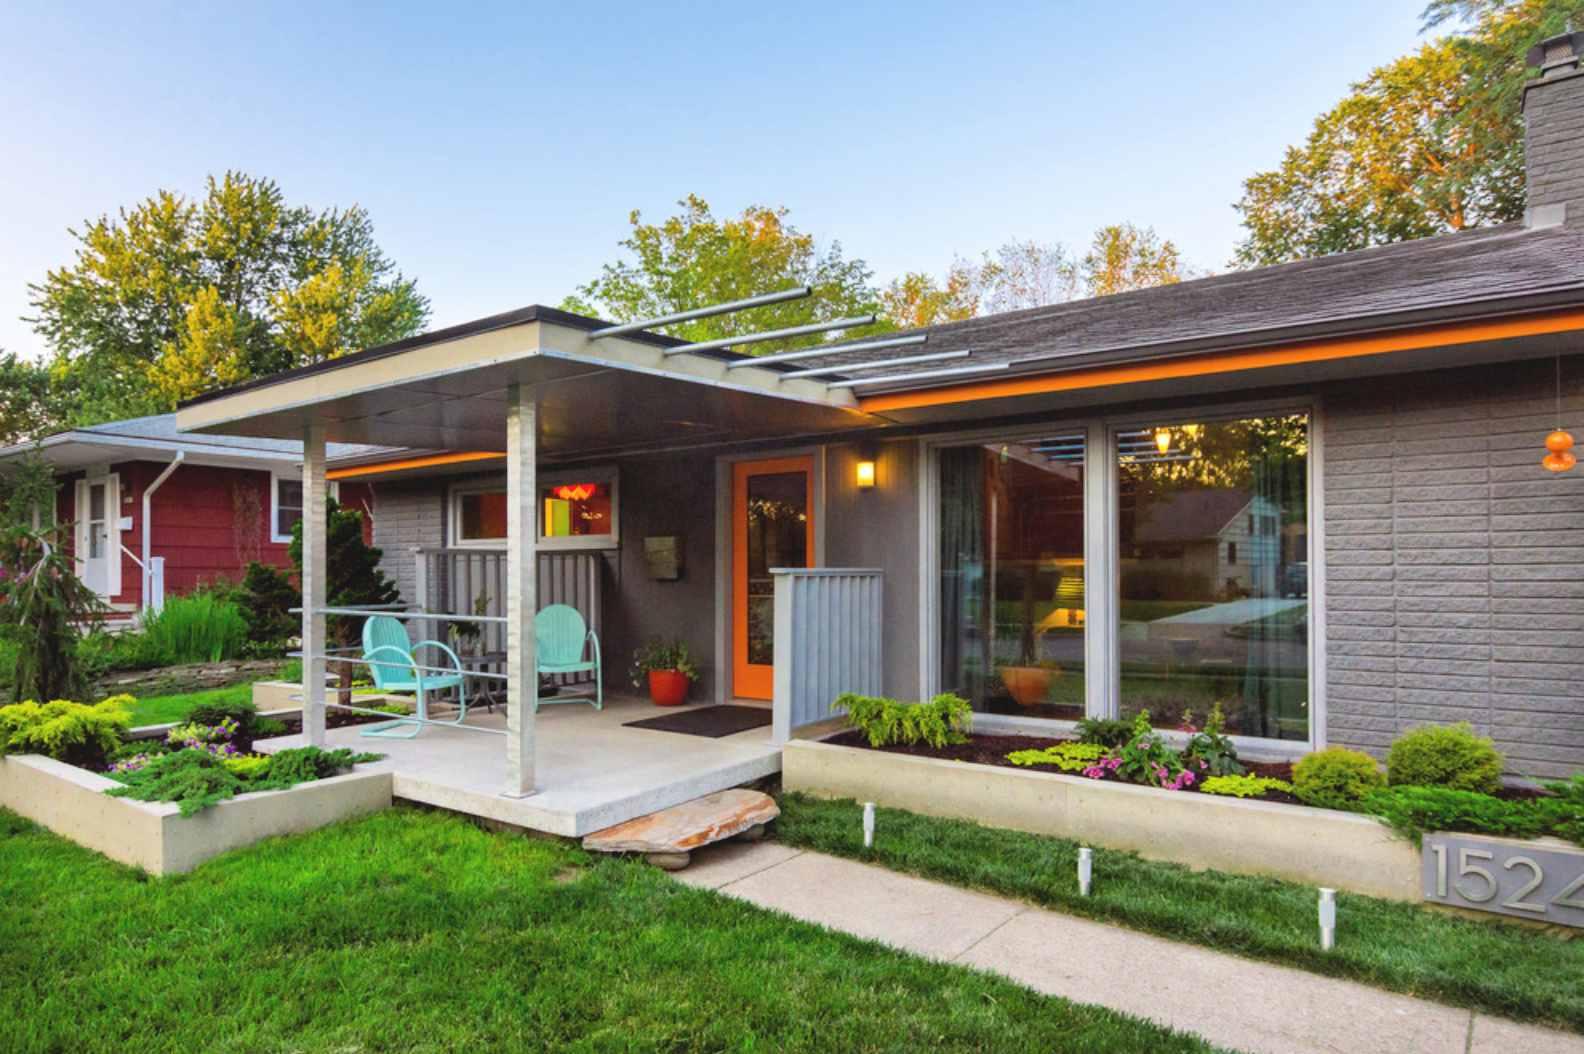 9 Garden Designs for Midcentury Modern Homes